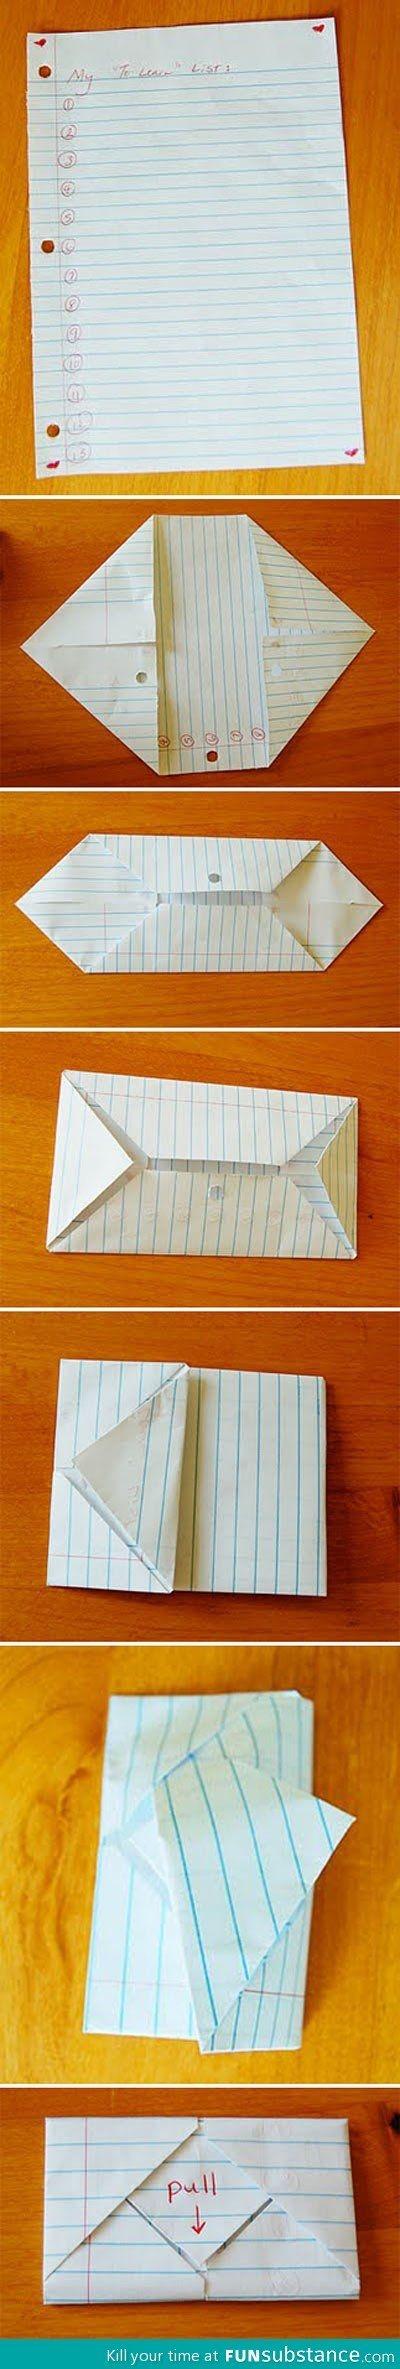 sherig47에 의해 메모 봉투를 접어하는 방법